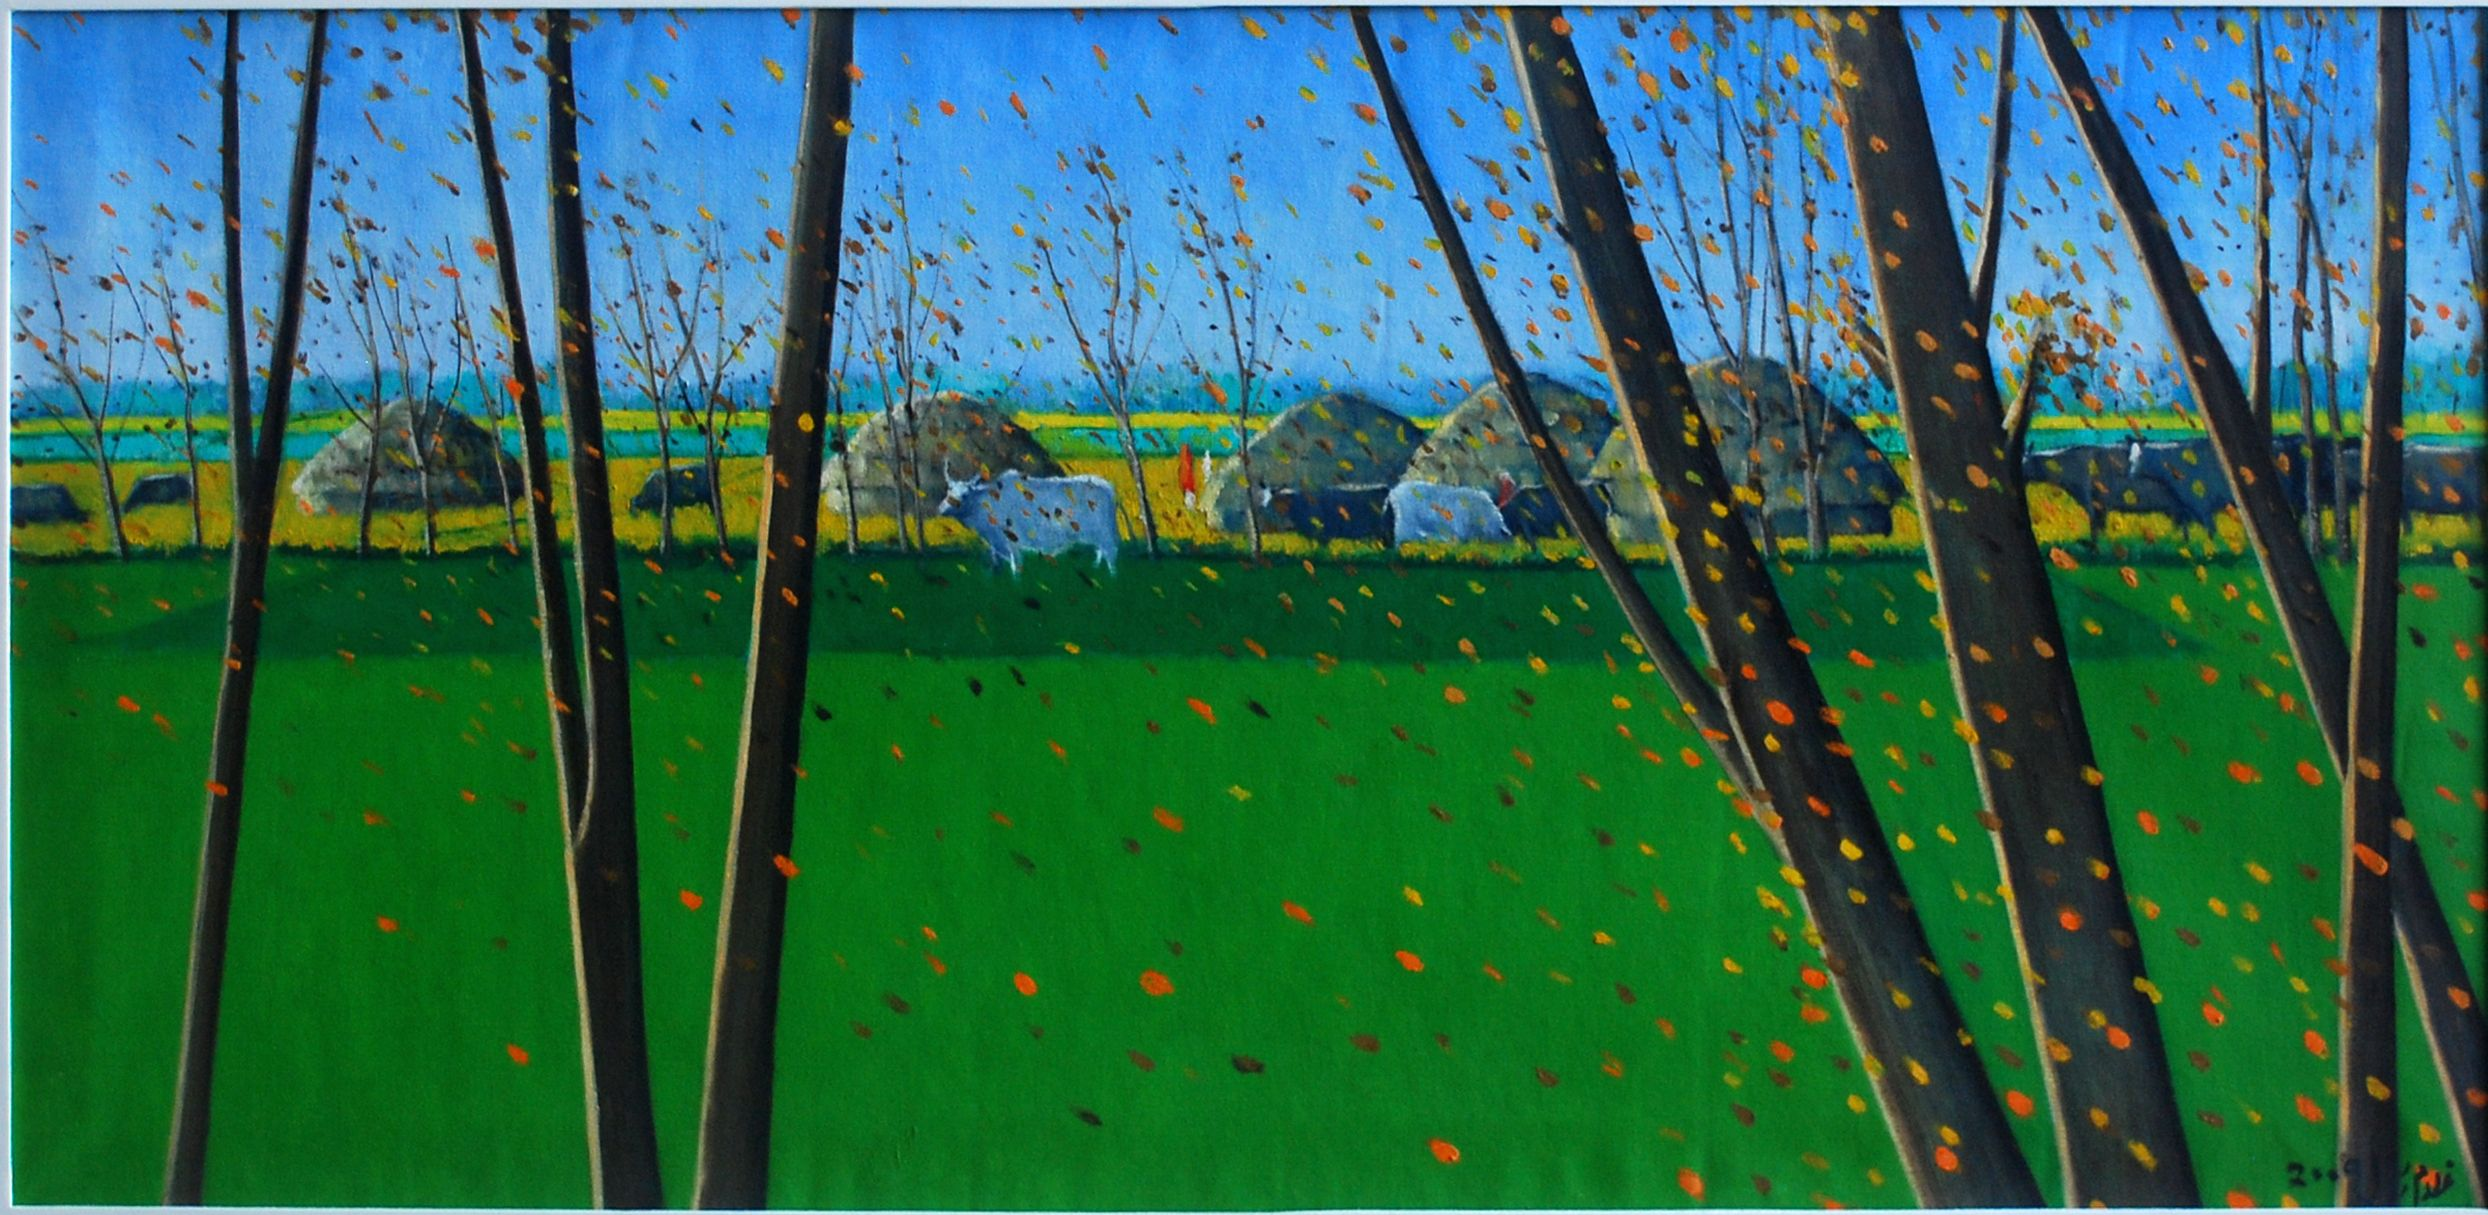 Title: Winter Landscape Available  Contact :: rasuls_studio542@hotmail.com  #GhulamRasul #LandscapeArtist #Landscape